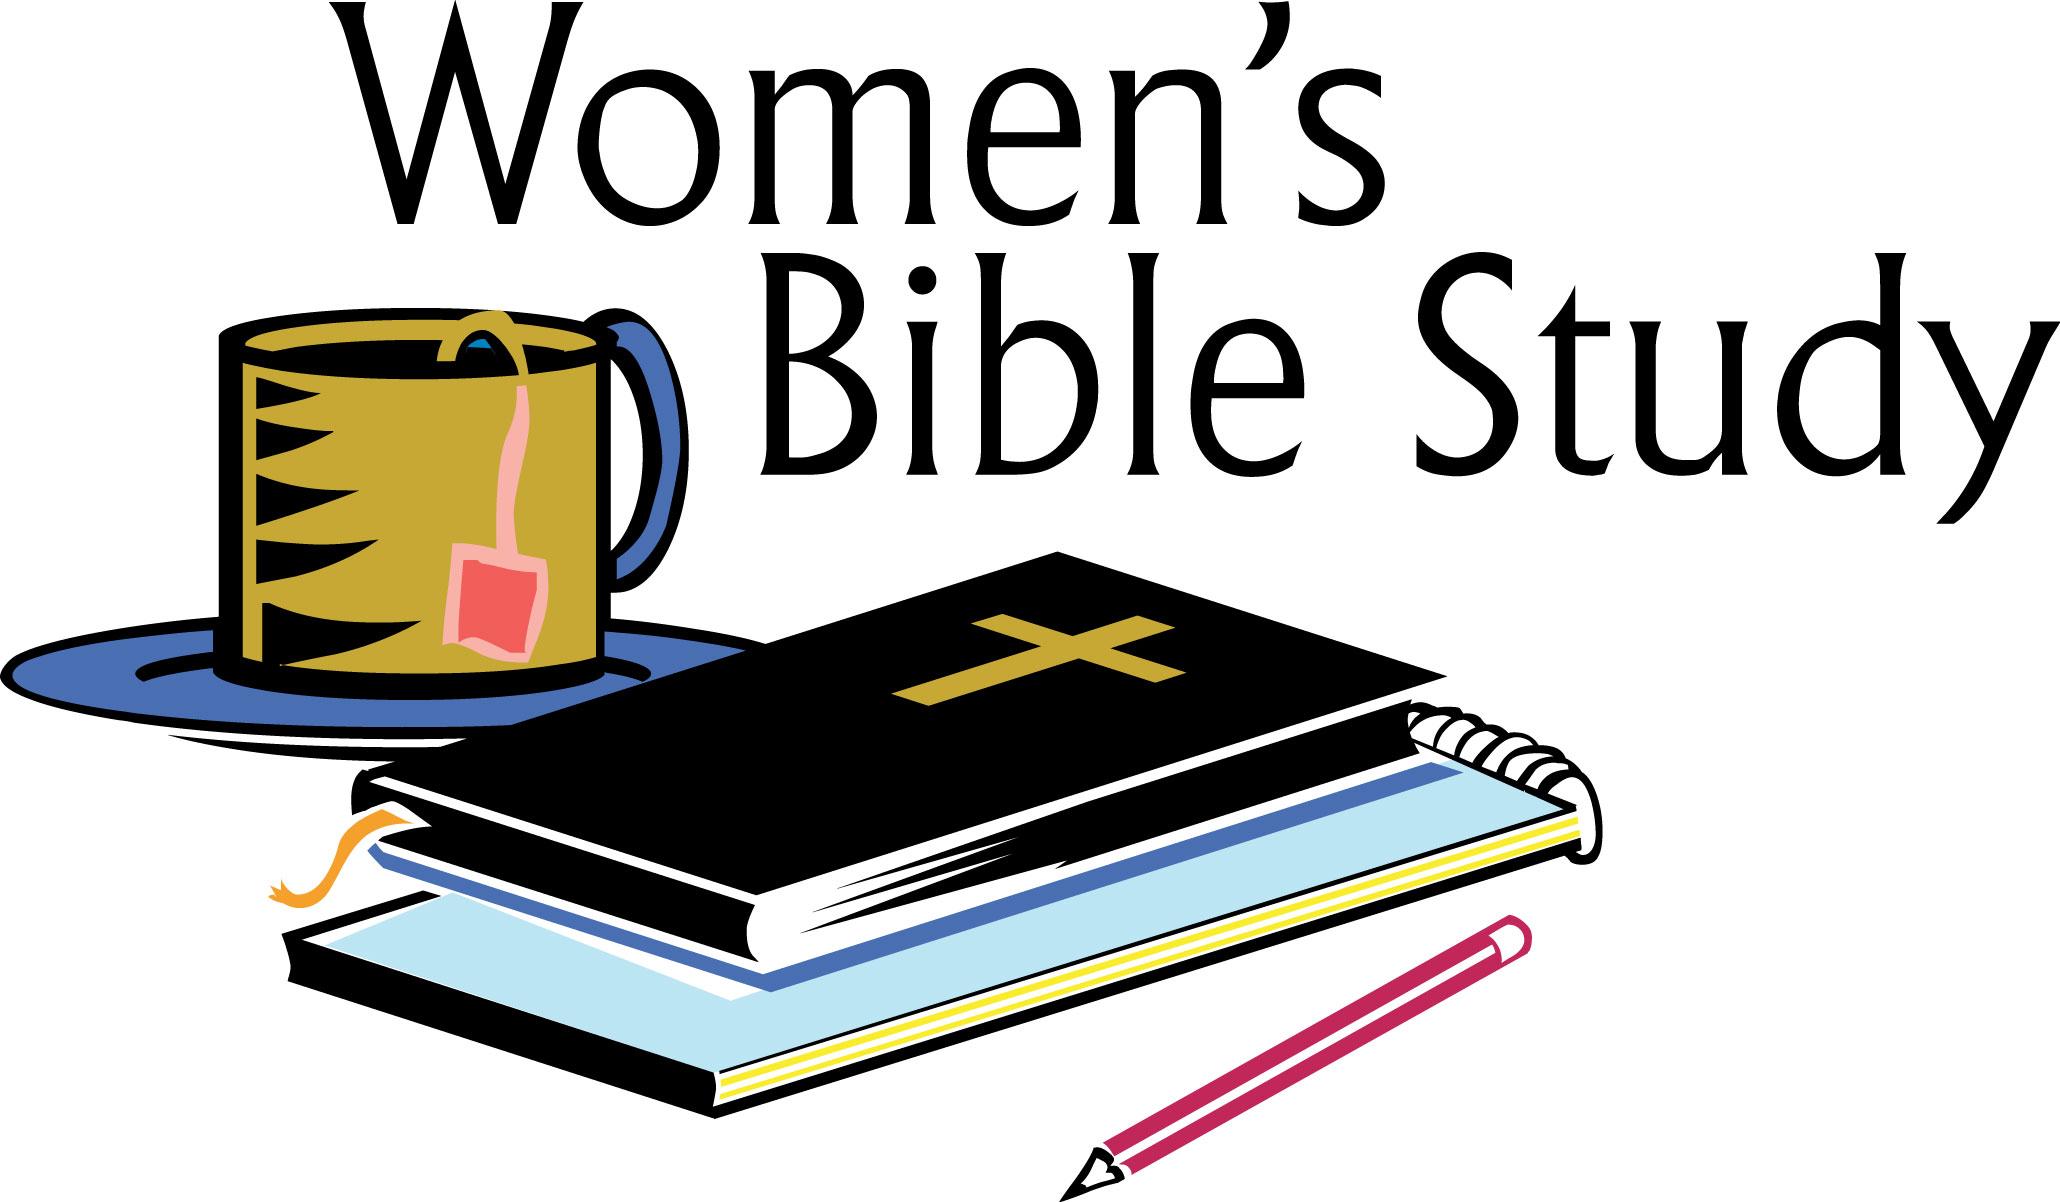 Bible study clip art 2